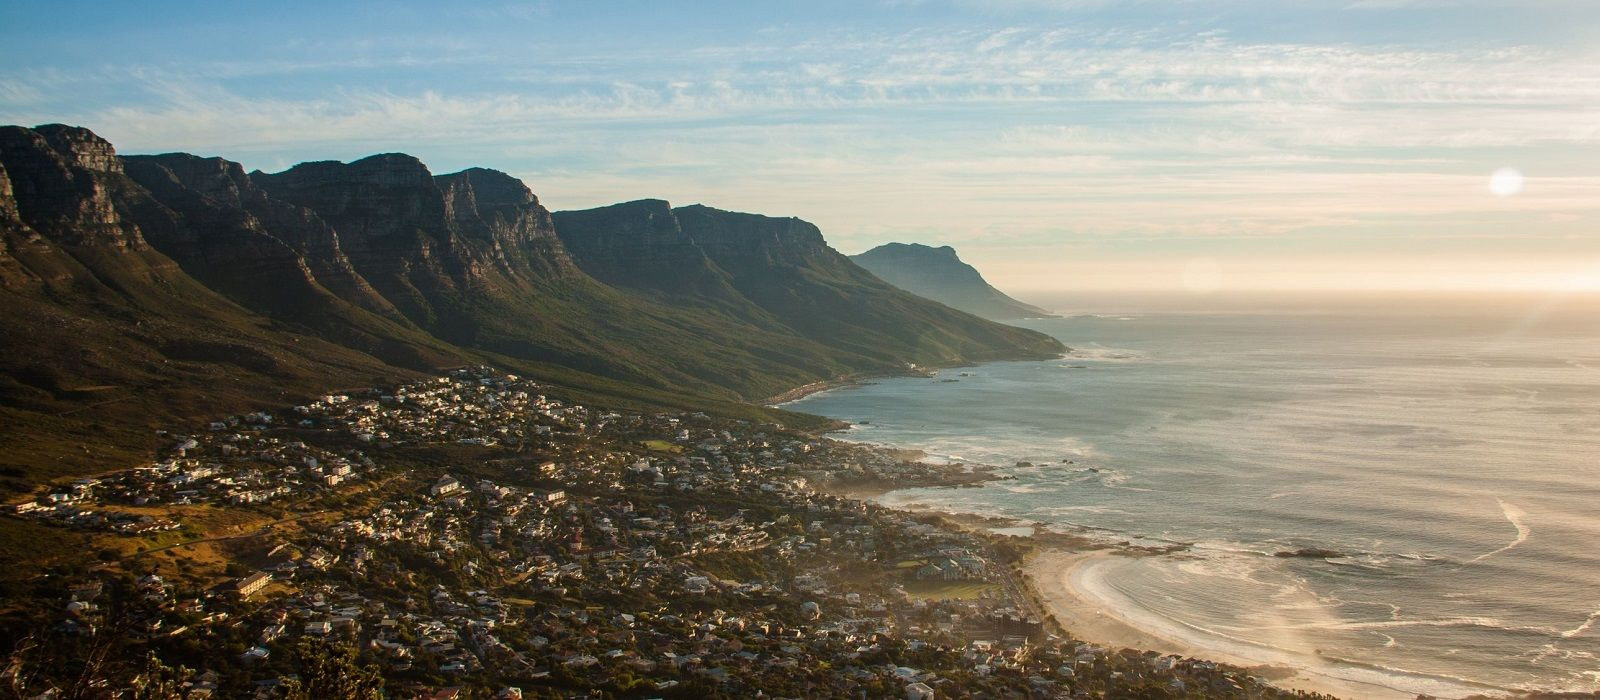 Selbstfahrer-Reise nach Südafrika, Namibia & Simbabwe: Nord Kap via Caprivi und Viktoriafälle Urlaub 2